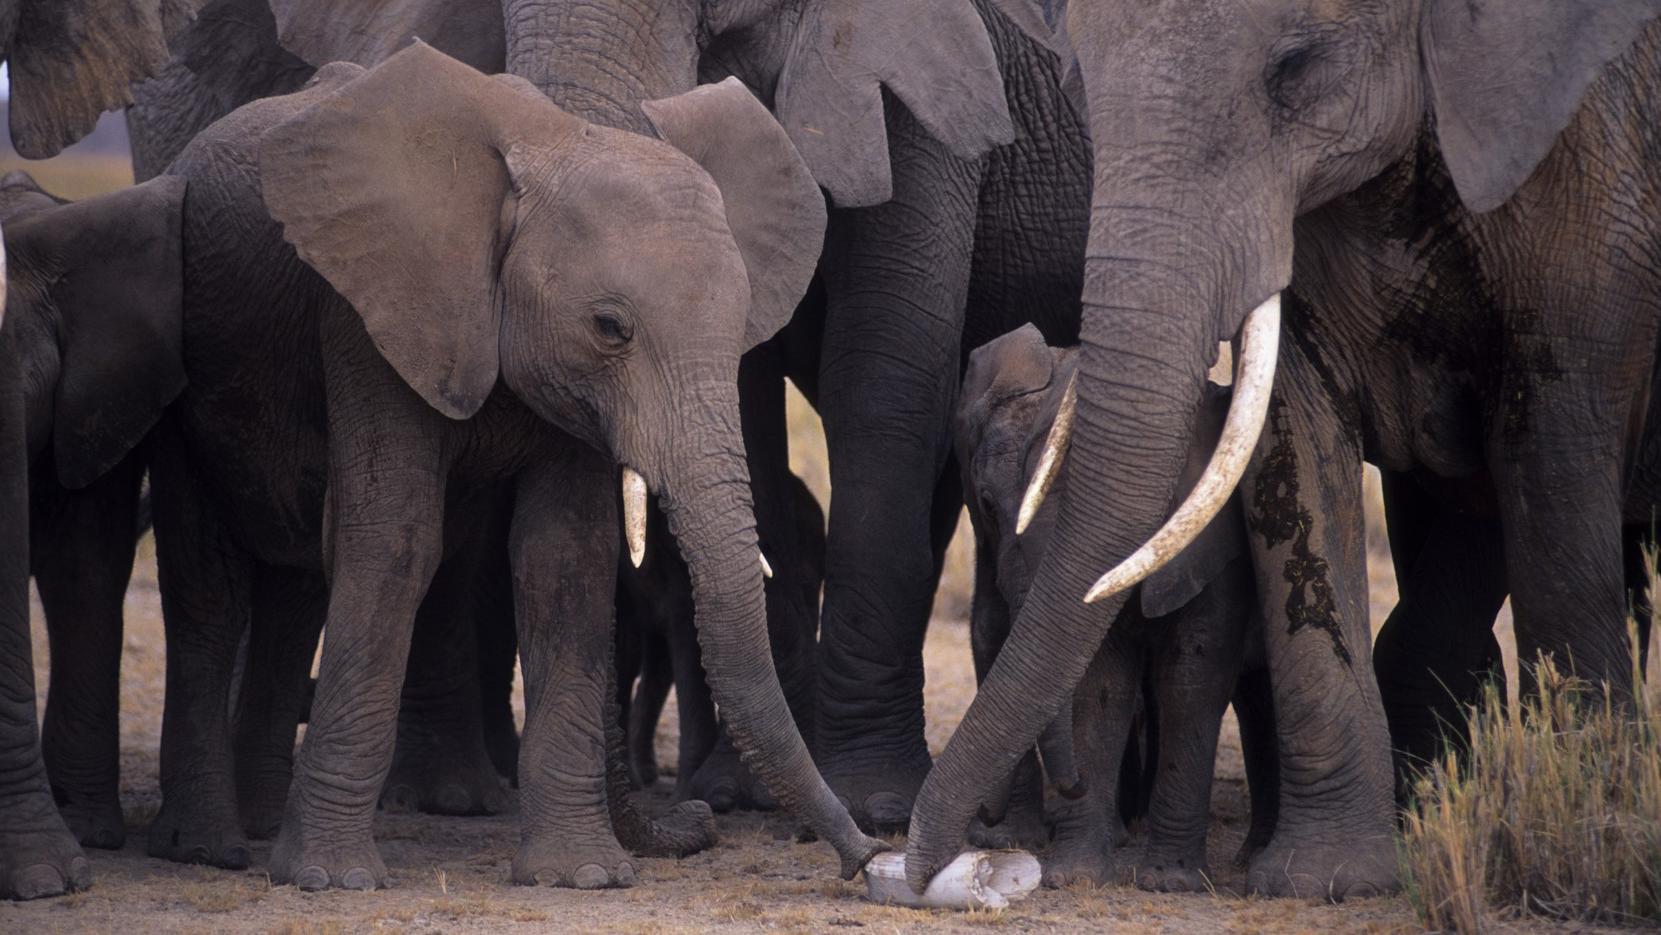 elephants_01_0.jpg